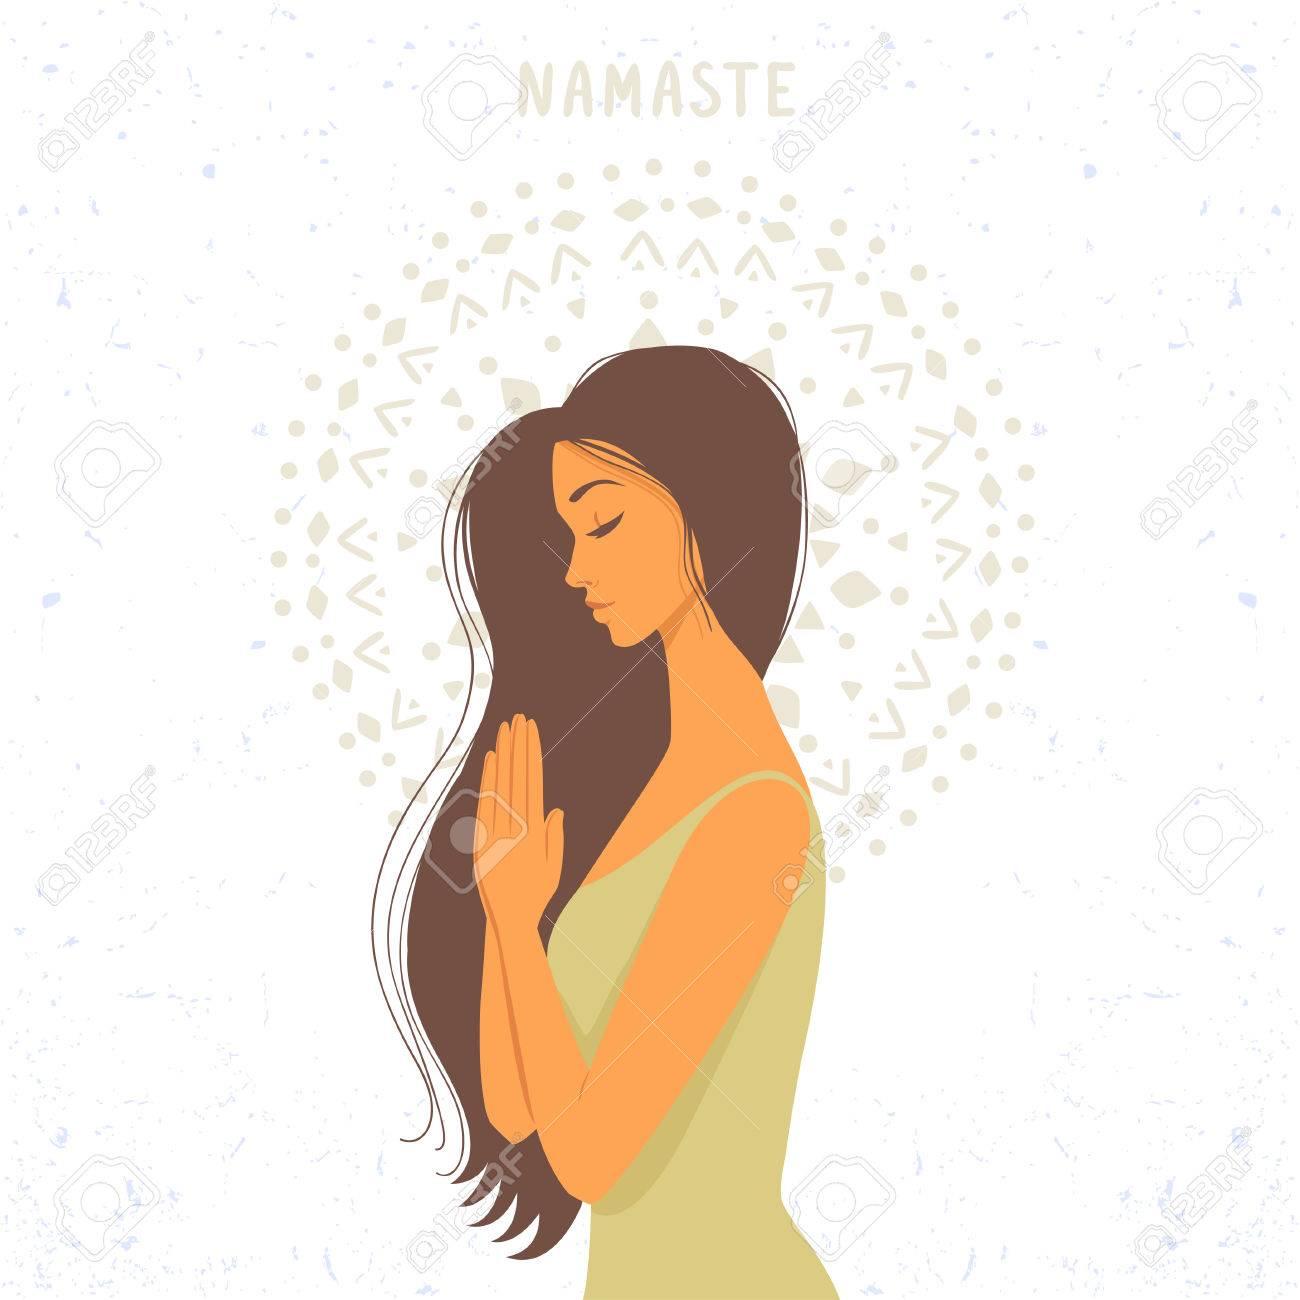 Amazing Cartoon Girl In Greeting Pose Namaste Practicing Yoga